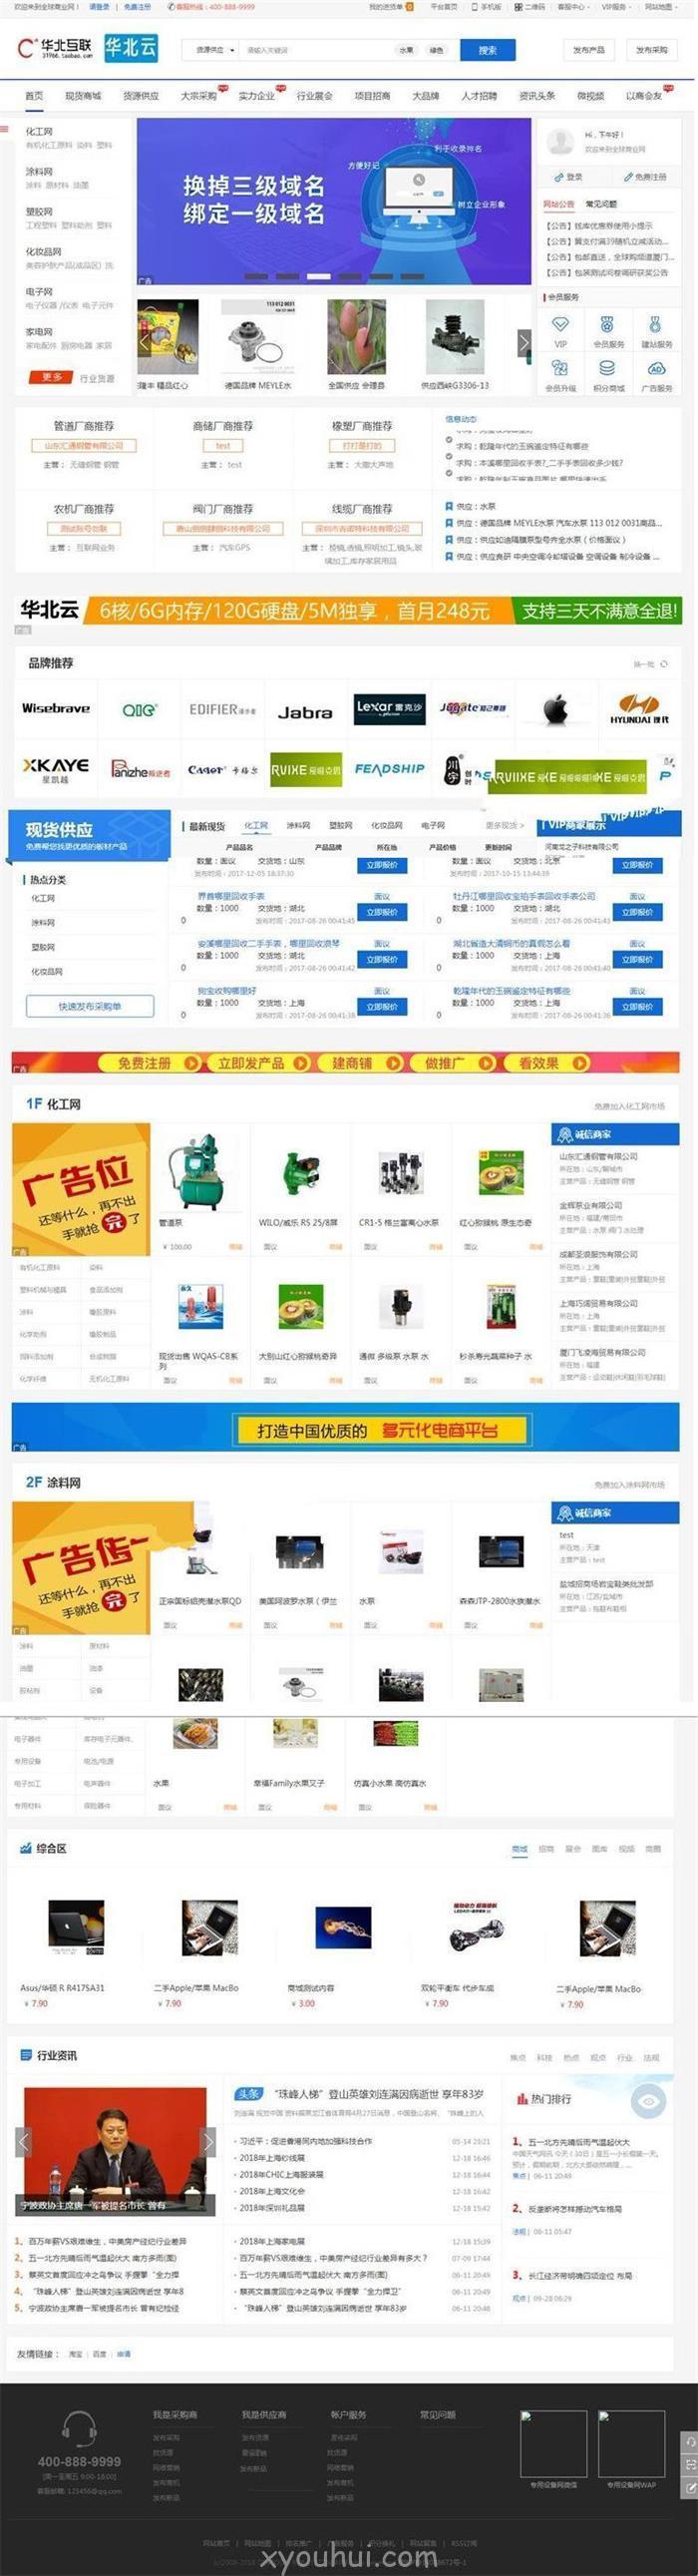 20200525163139_83316.jpg 蓝色宽屏大气大型行业门户网站模板整站源码带数据 PC+手机模板 destoon7.0  免费源码 第1张